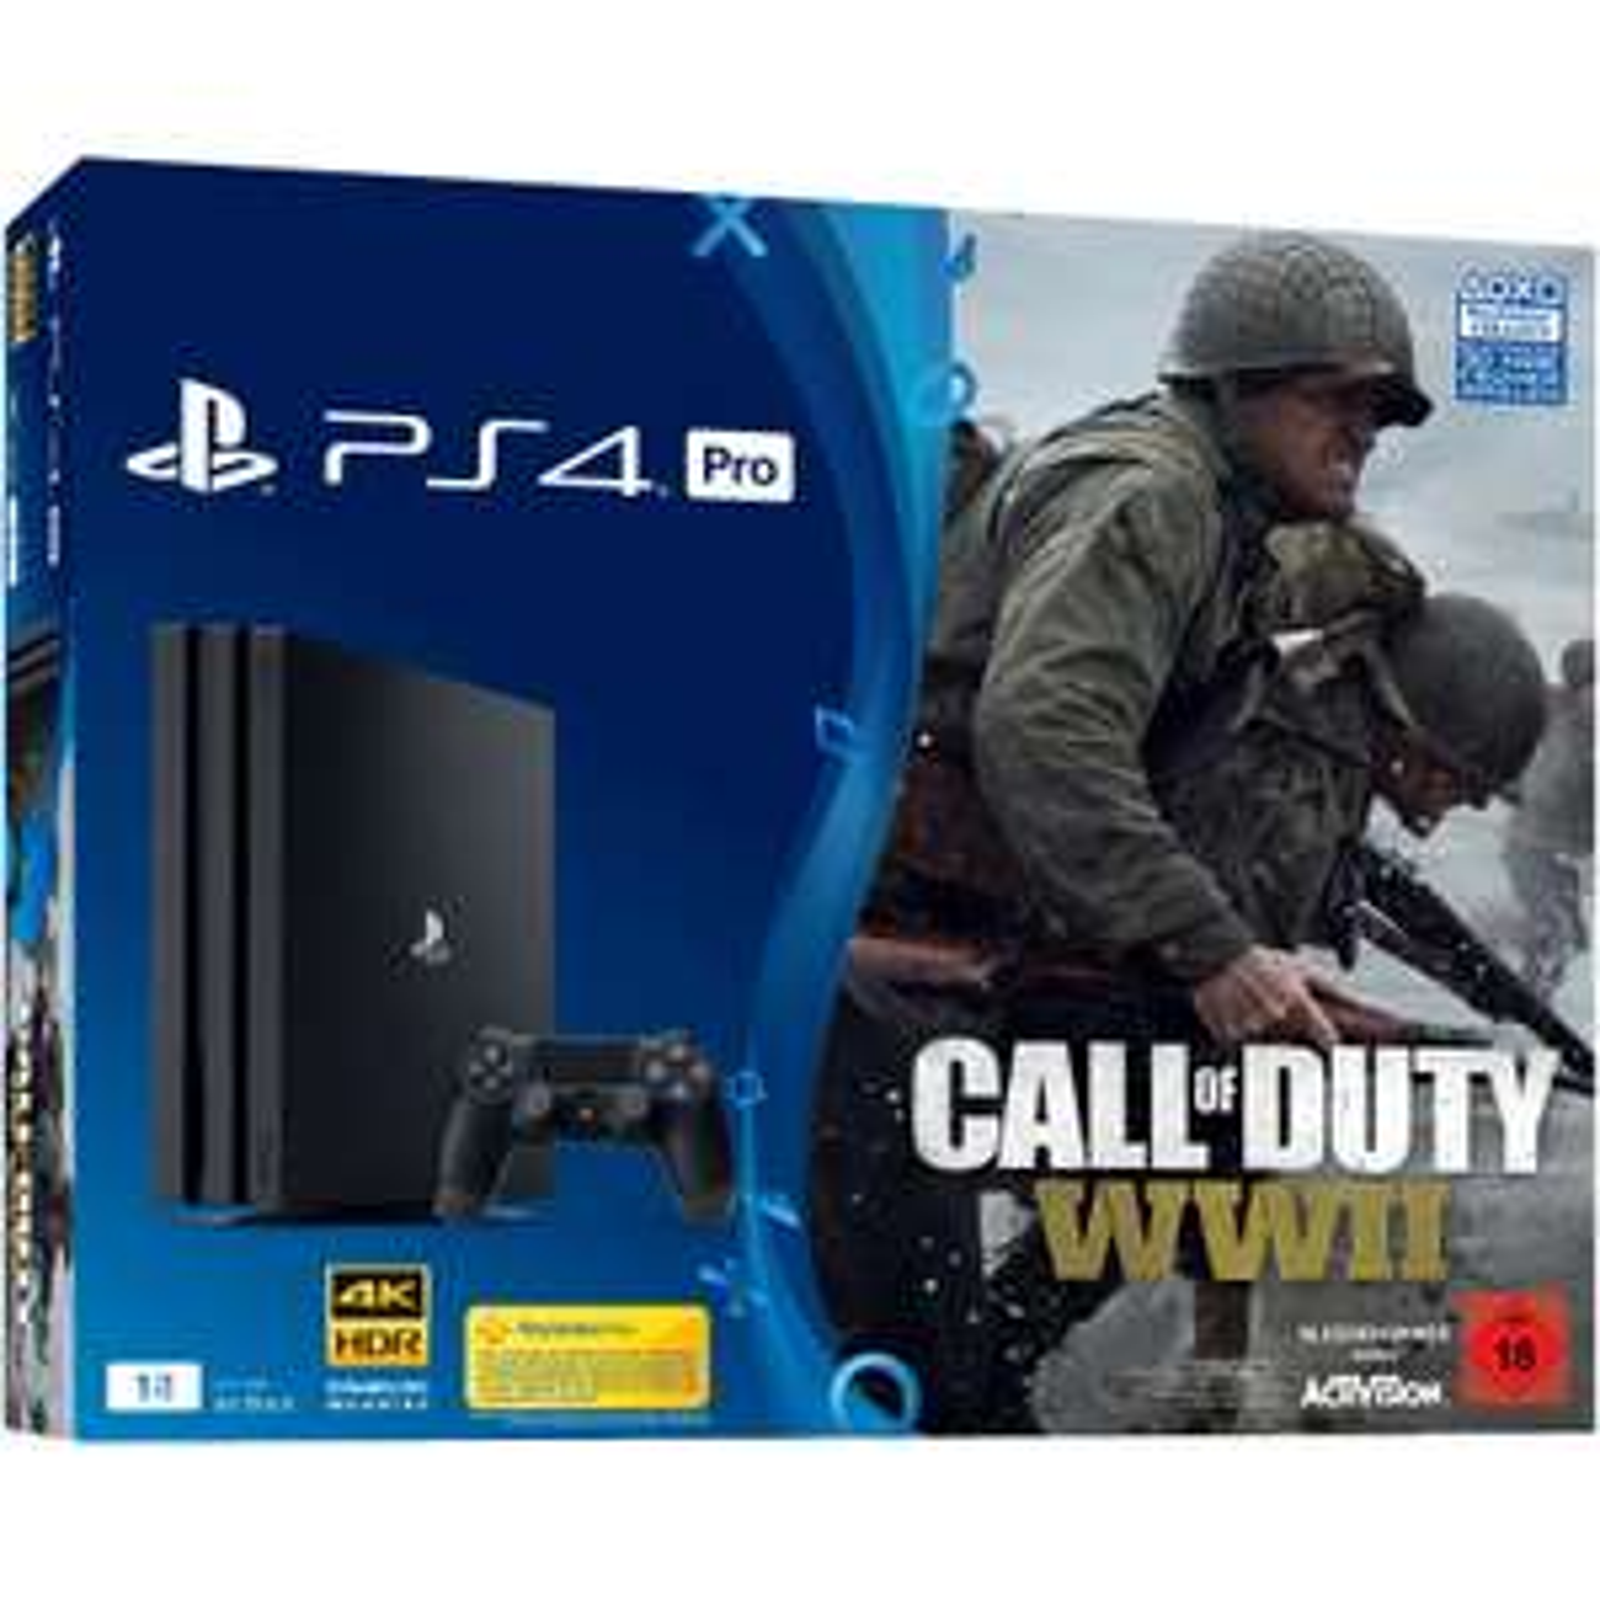 [Mediamarkt-Ebay] SONY PlayStation 4 Pro 1TB Schwarz + Call of Duty WWII + That's You Voucher